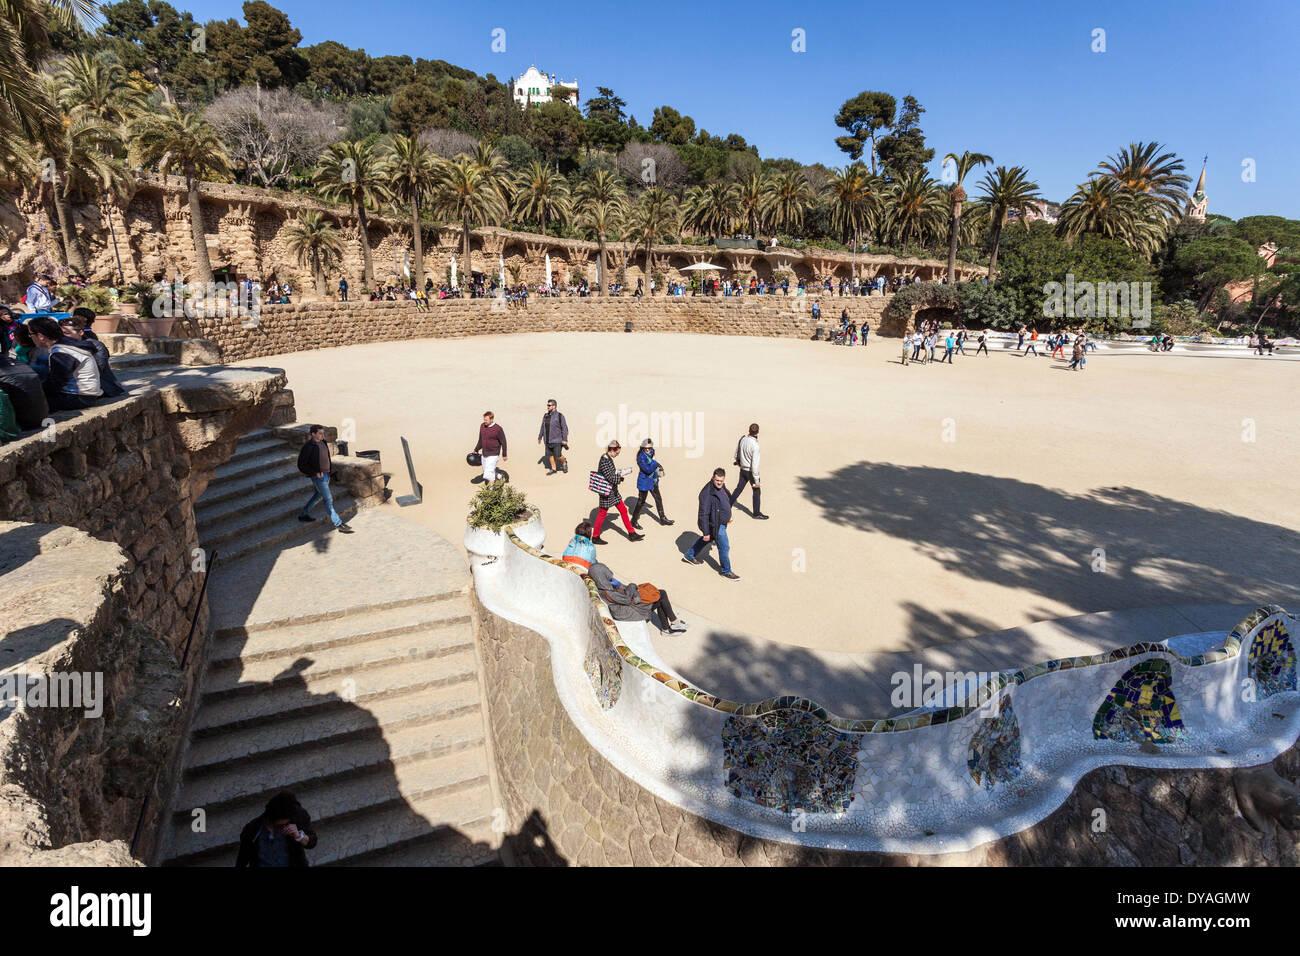 Plaza de la Naturaleza, Parc Güell, Barcelona Spain. Stock Photo